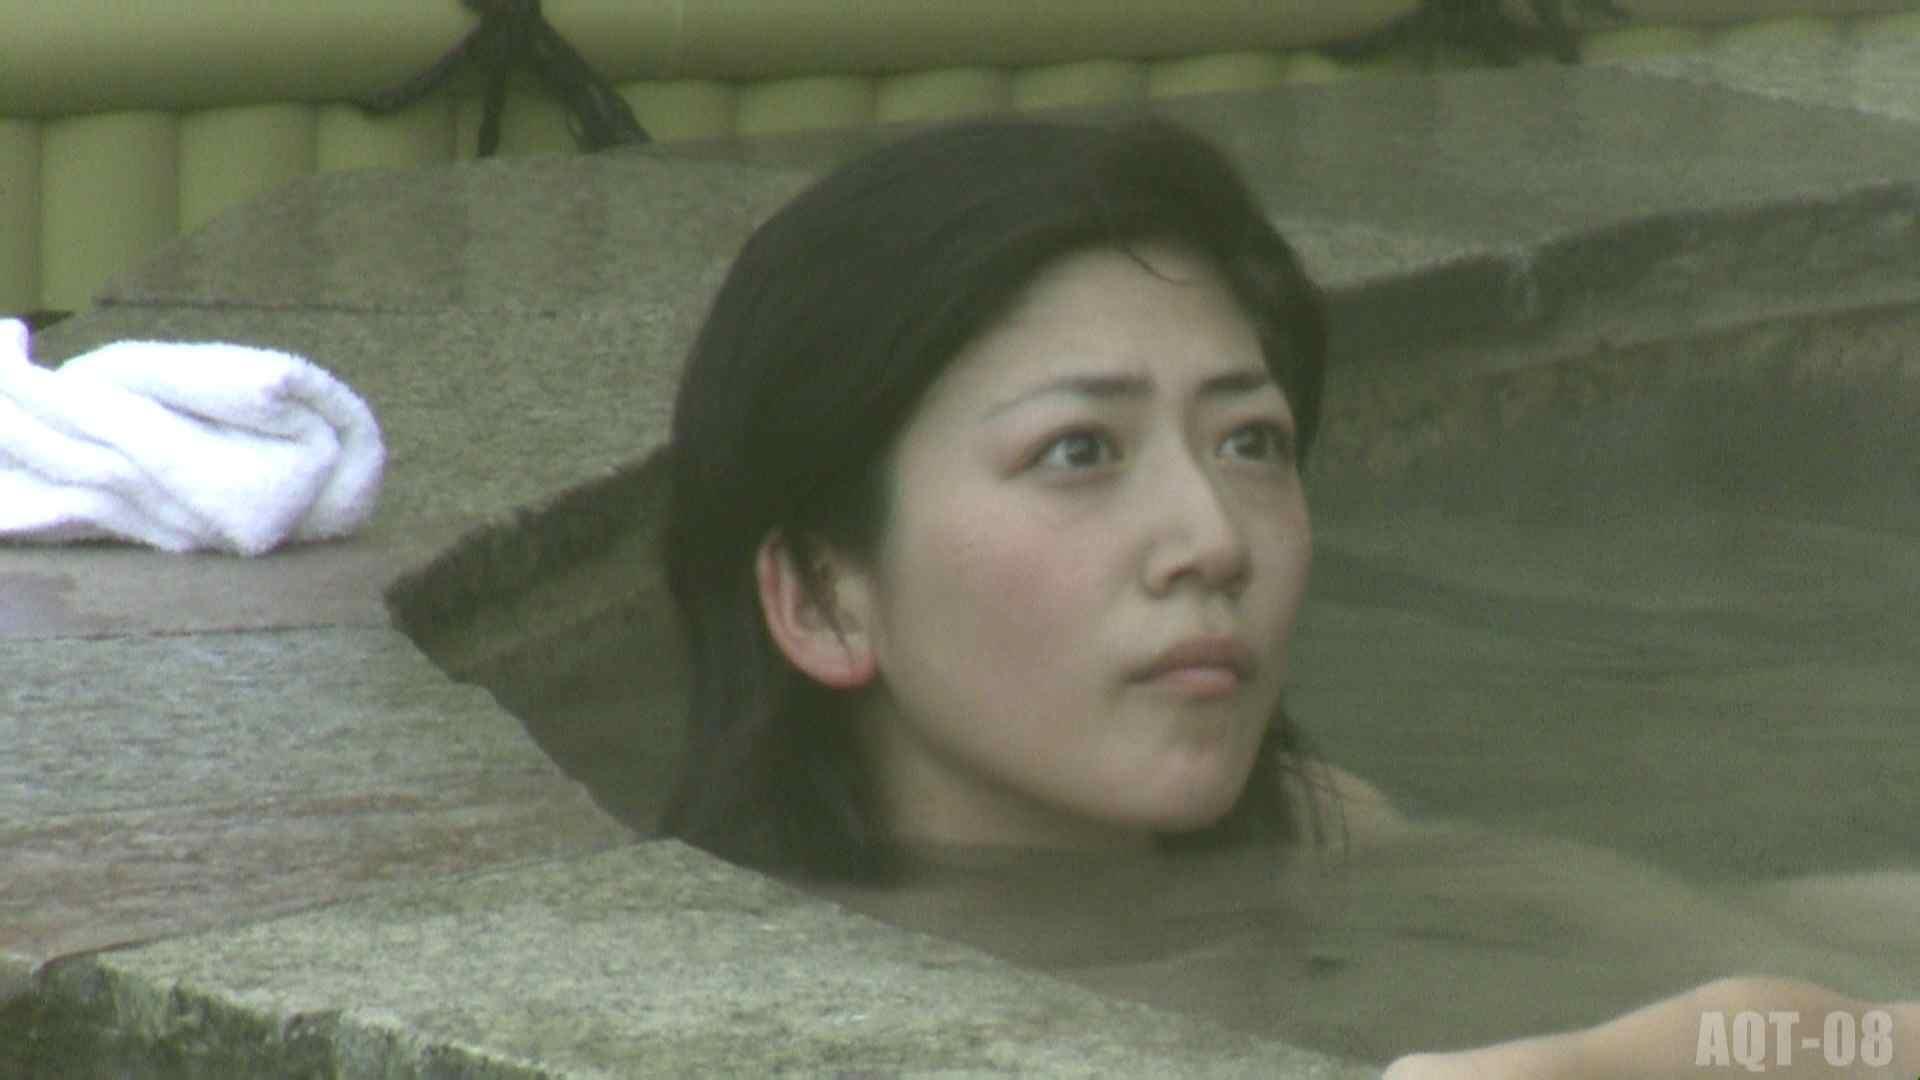 Aquaな露天風呂Vol.776 露天 | OLセックス  108画像 34